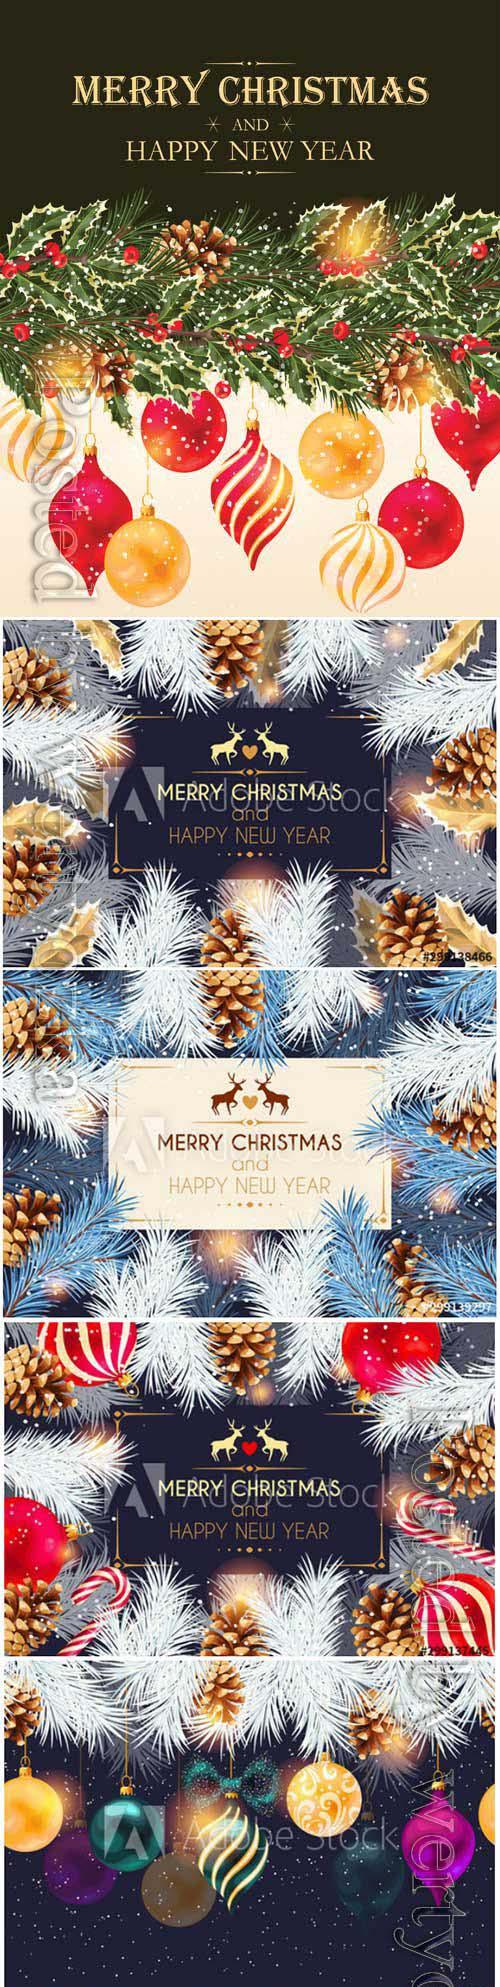 Christmas cards with cones, Christmas balls and Christmas tree